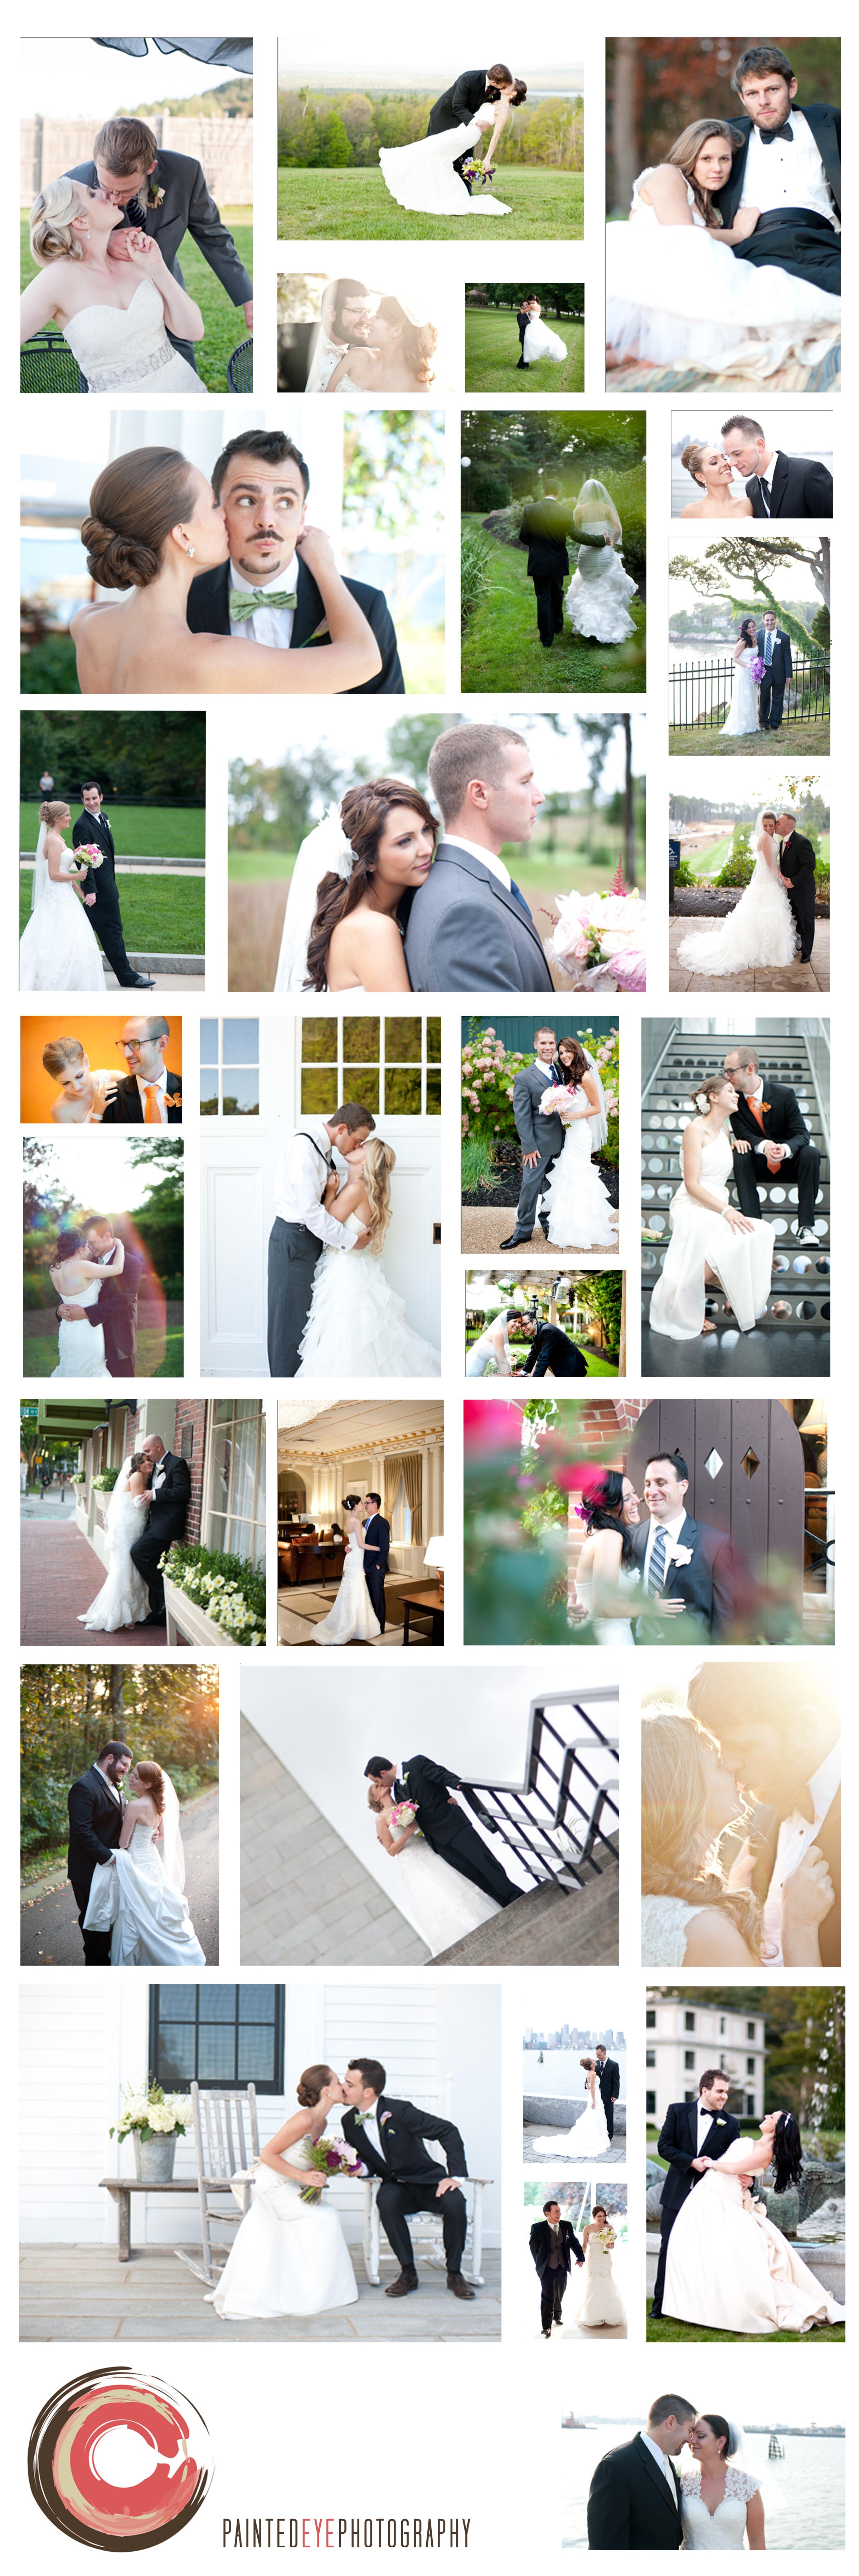 2012weddings-recap